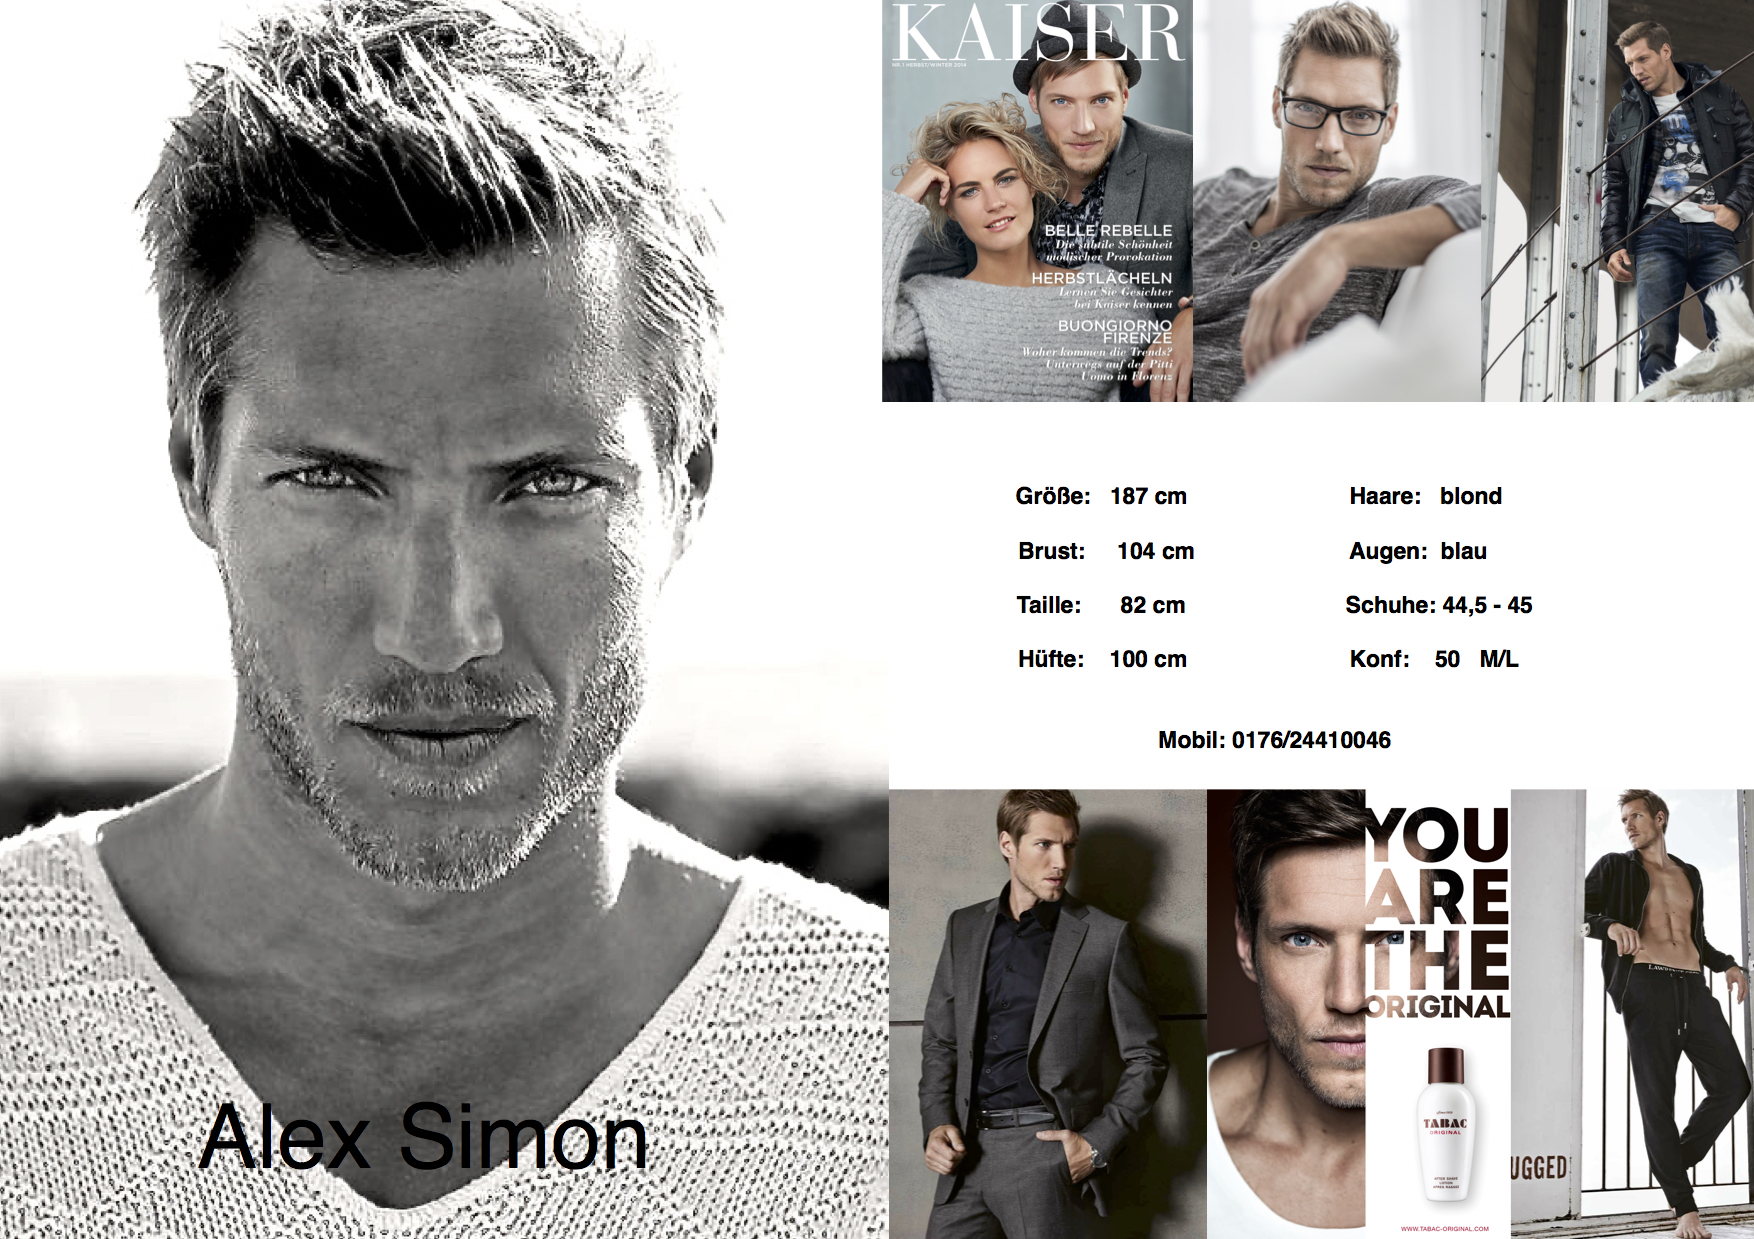 New fashion 2017 - Alex Simon Male Model Amp Actor 187 187 New Polas And Sedcards